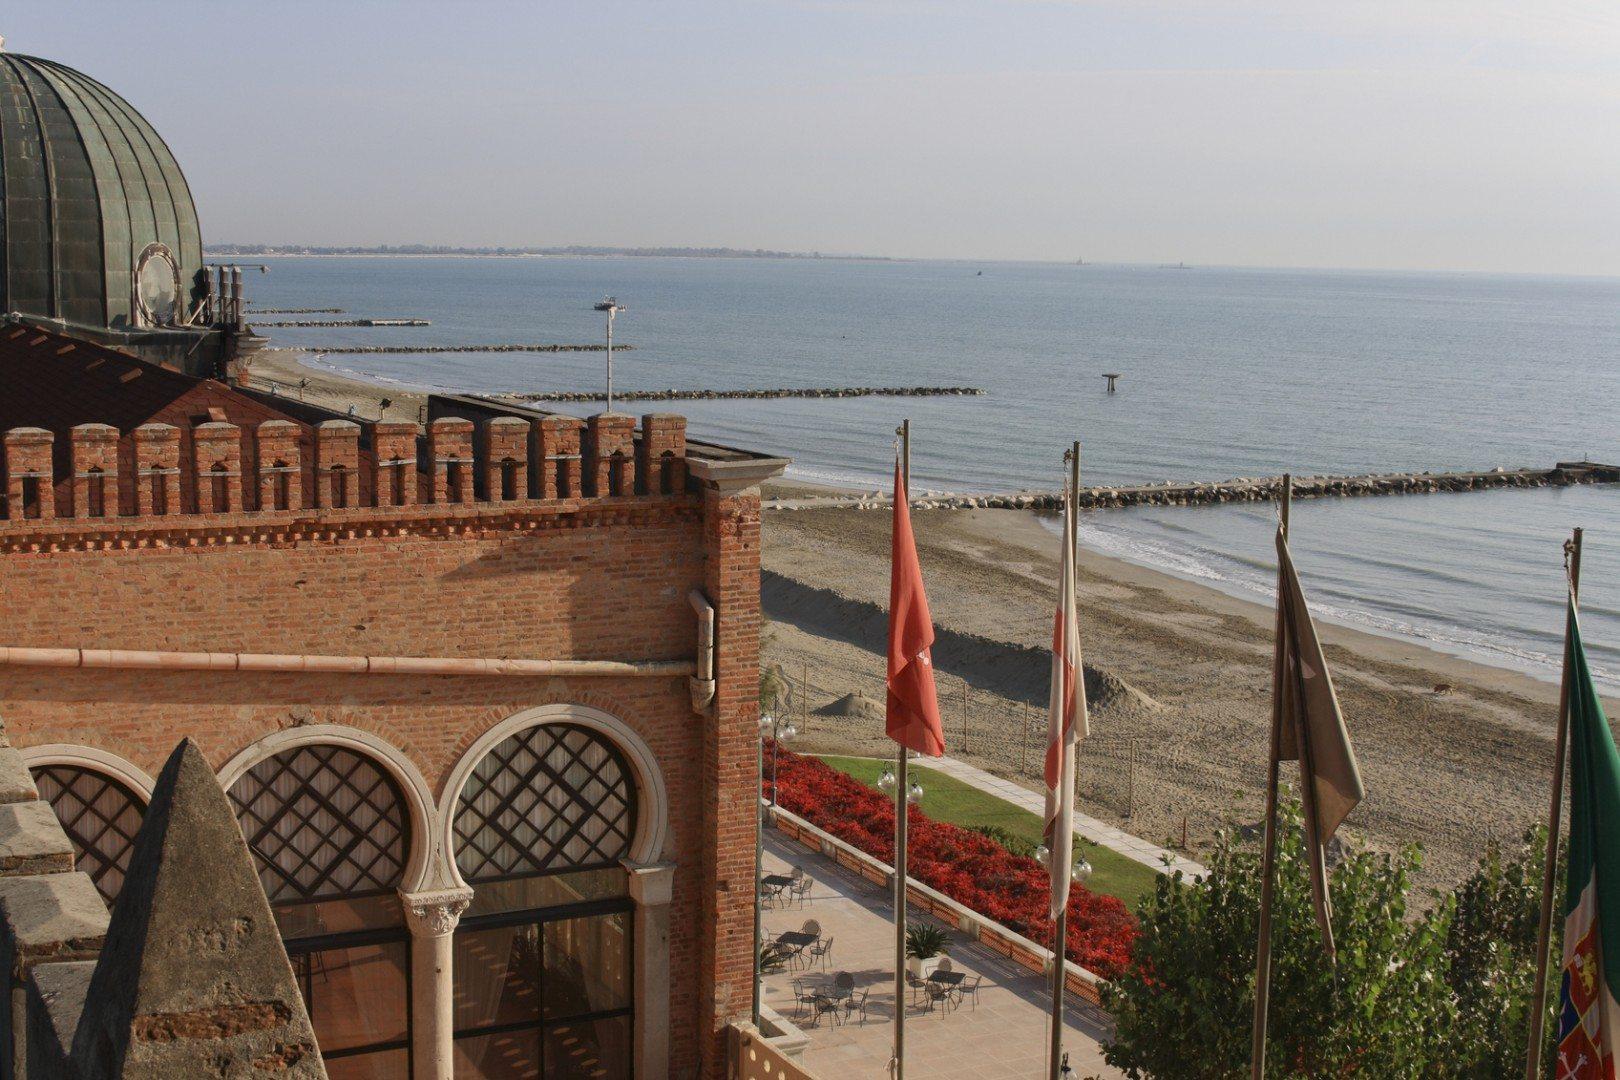 Lido Beach Venice Italy